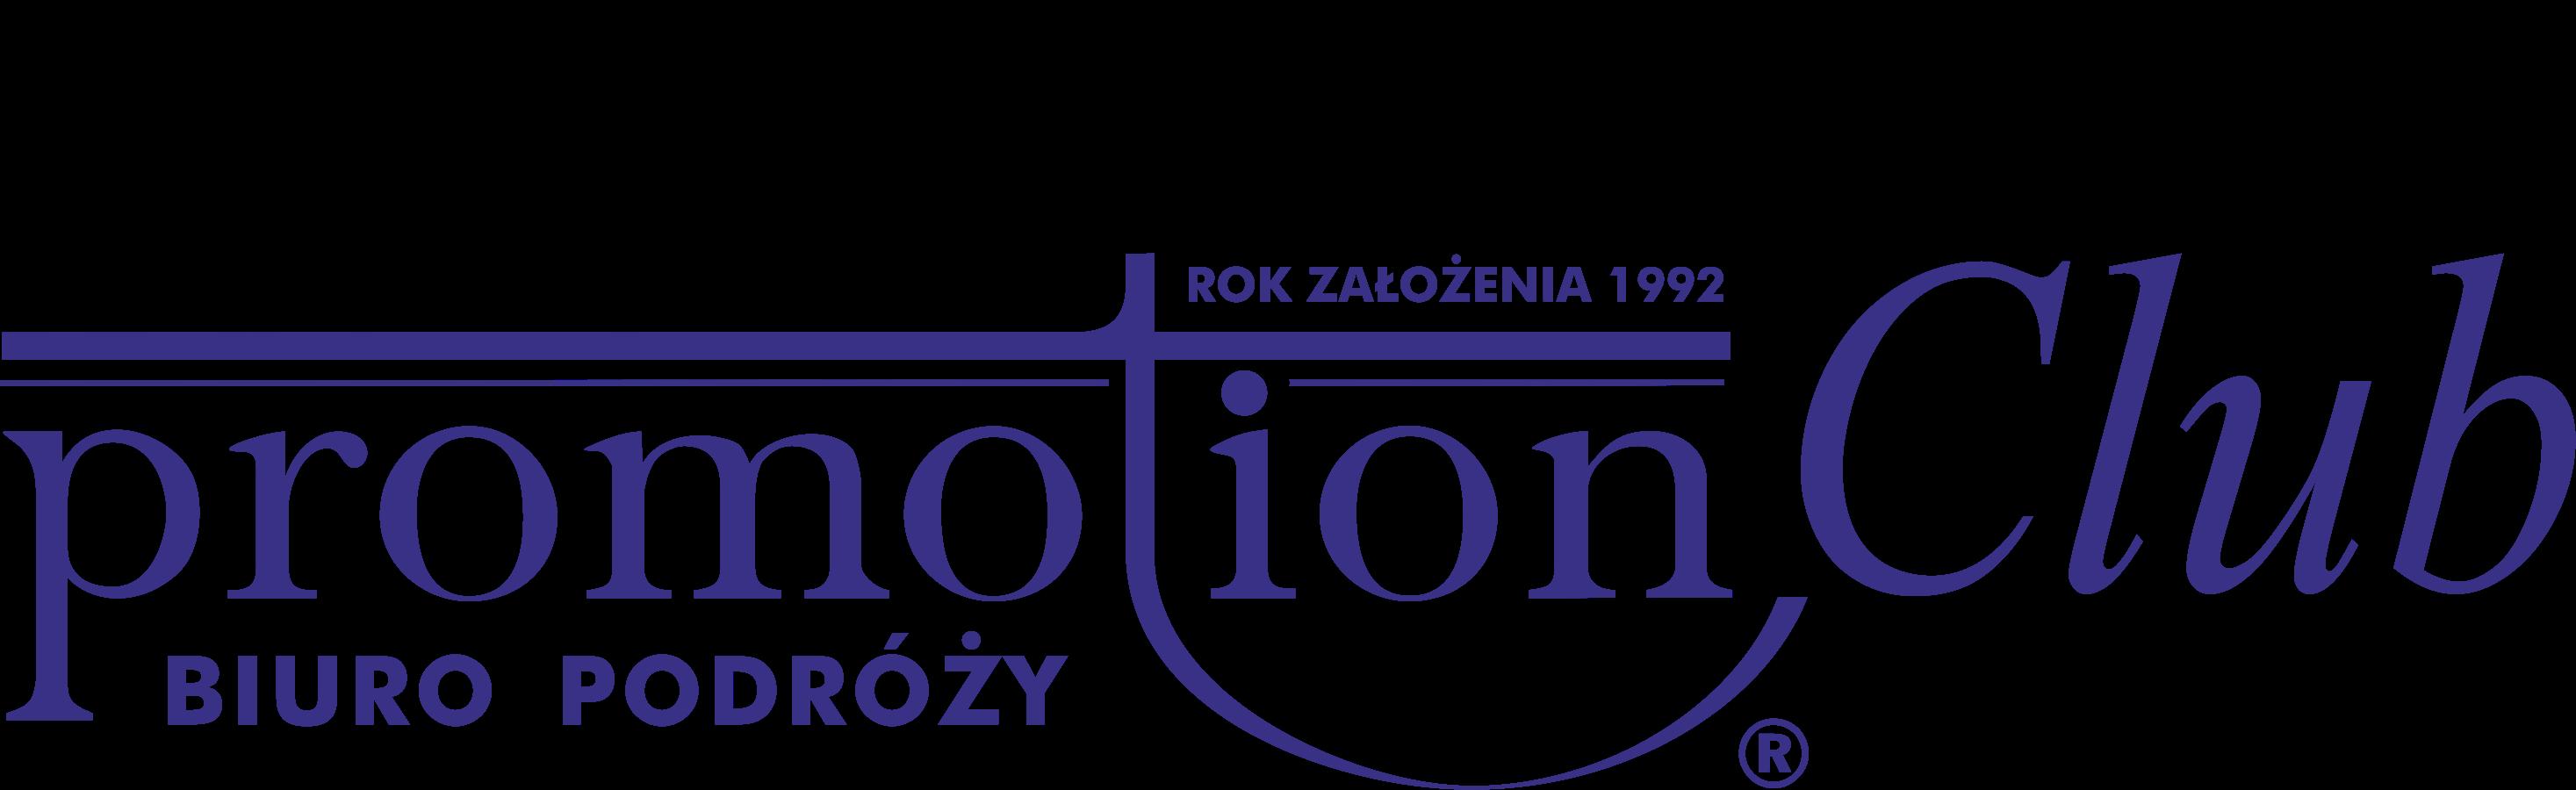 www.promoclub.pl